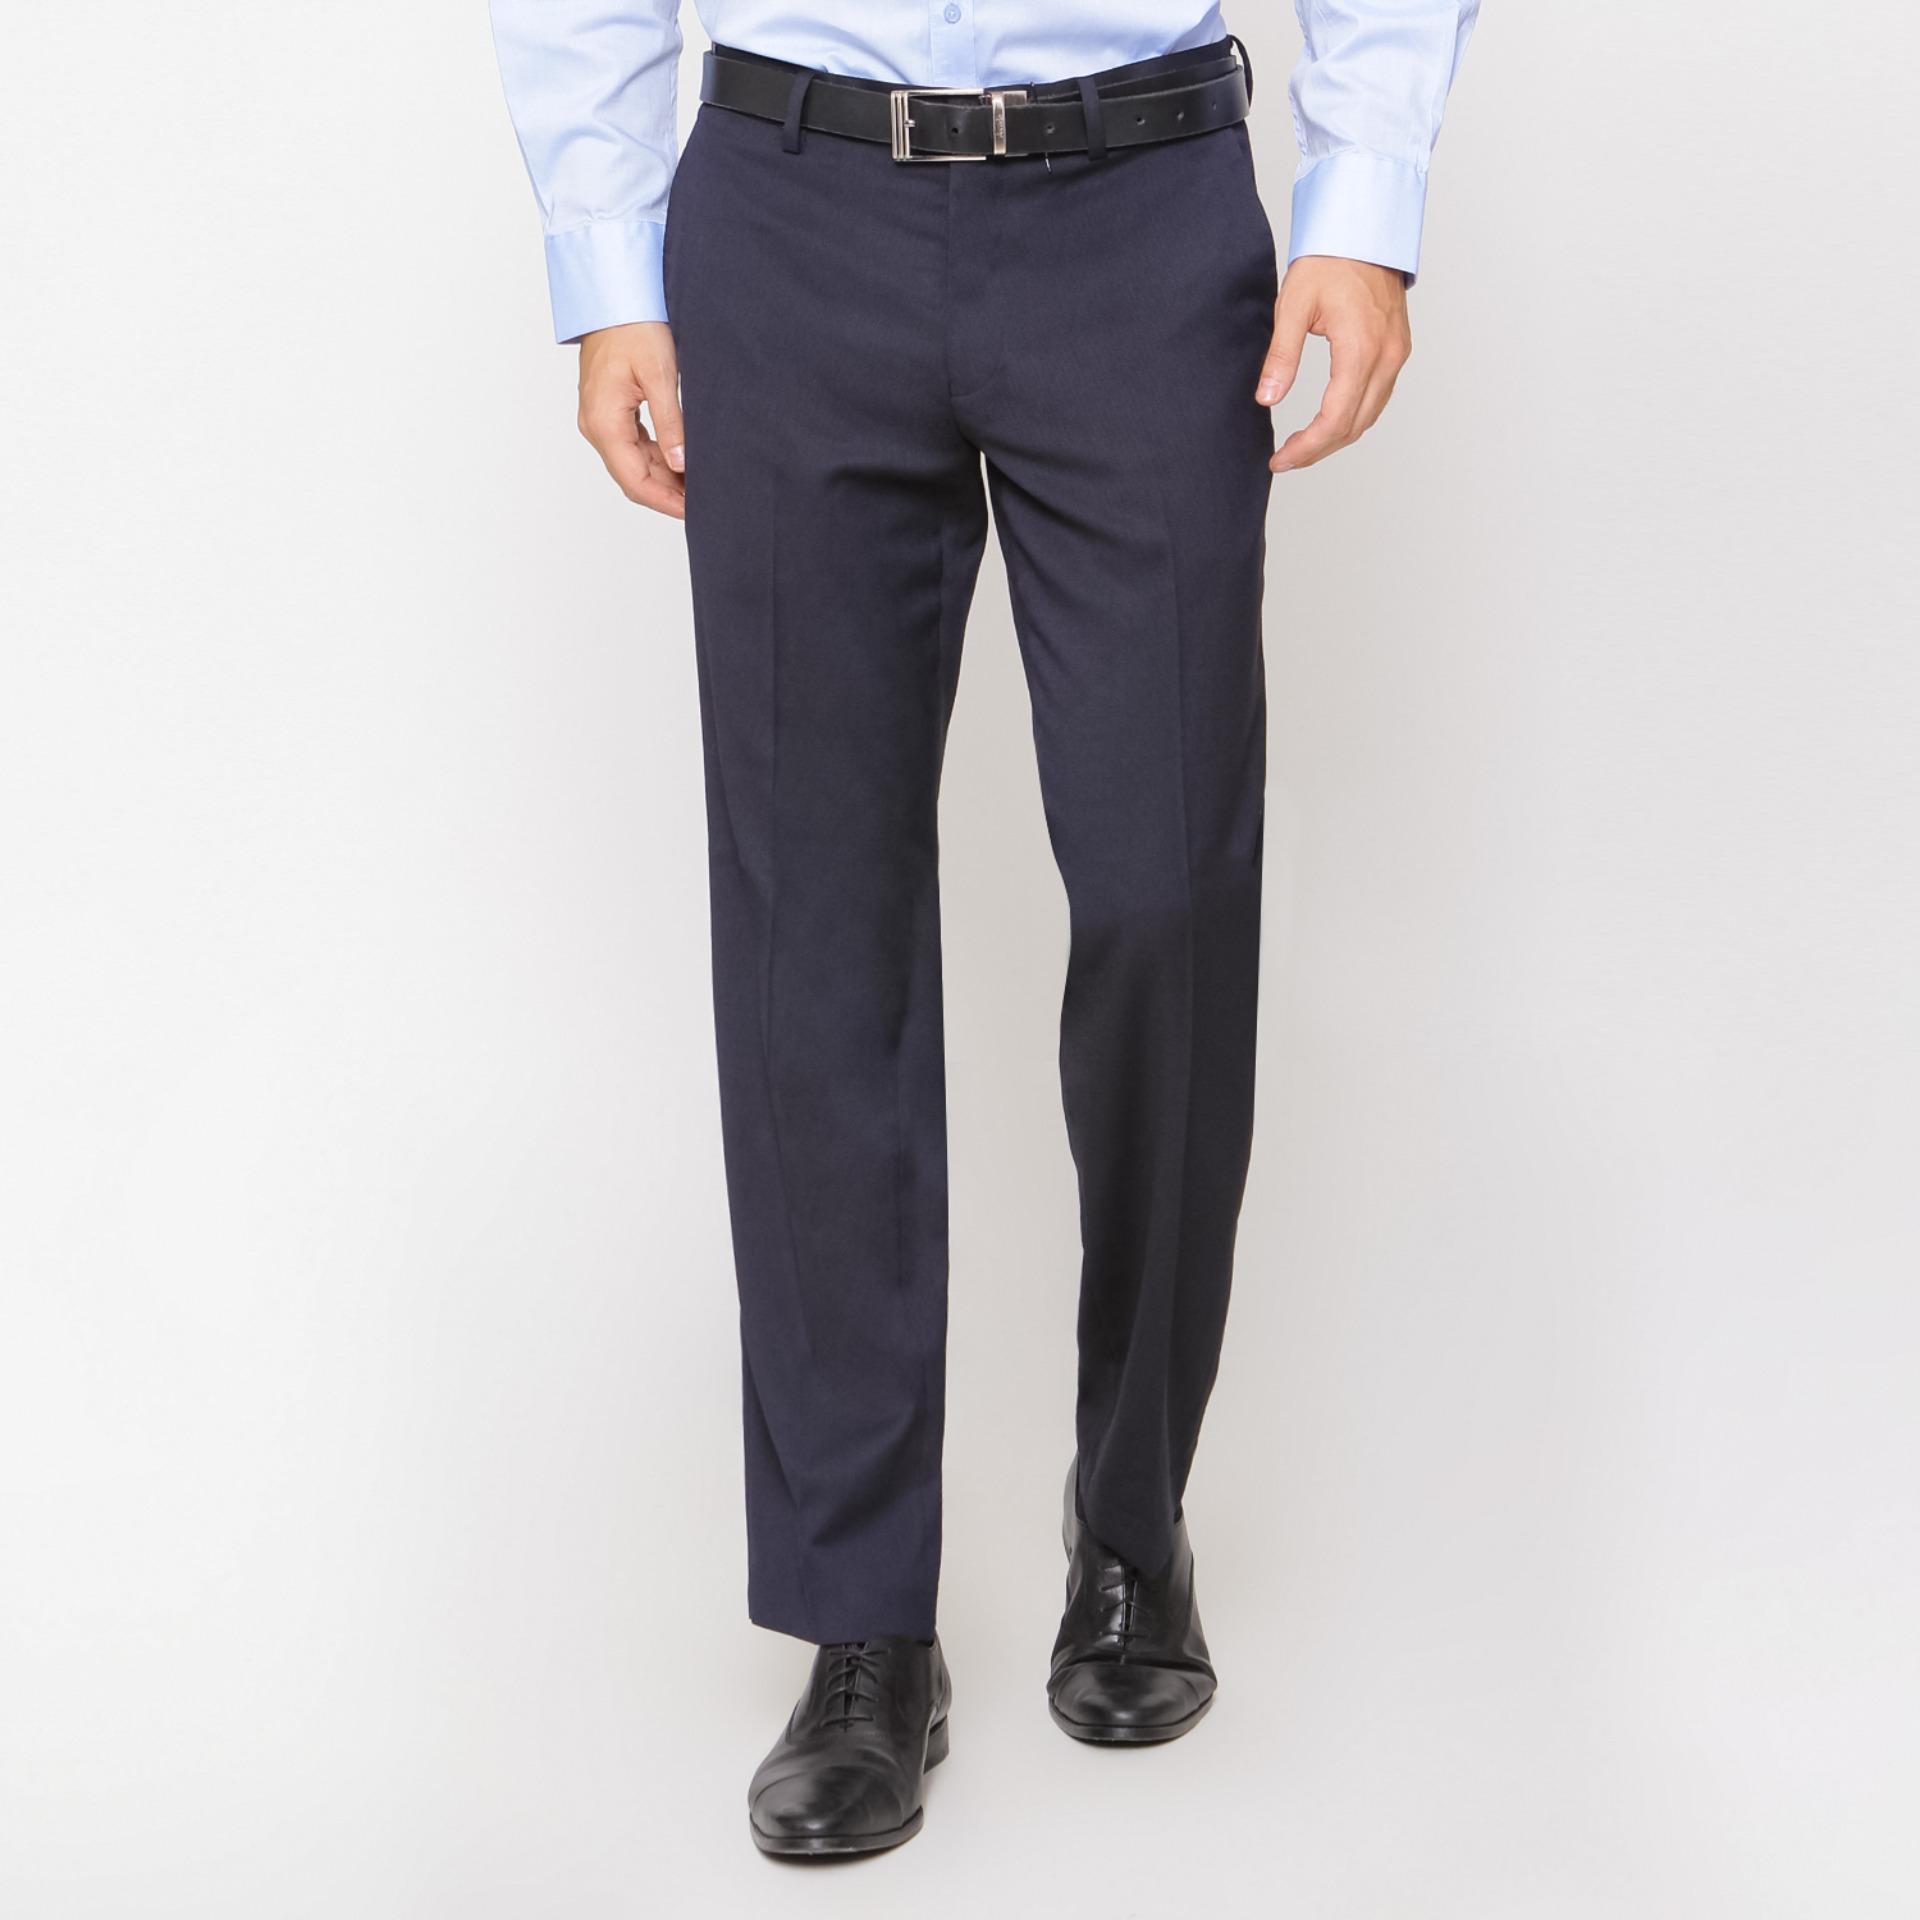 Beli Jobb Madison S Blue Night Pants Online Terpercaya